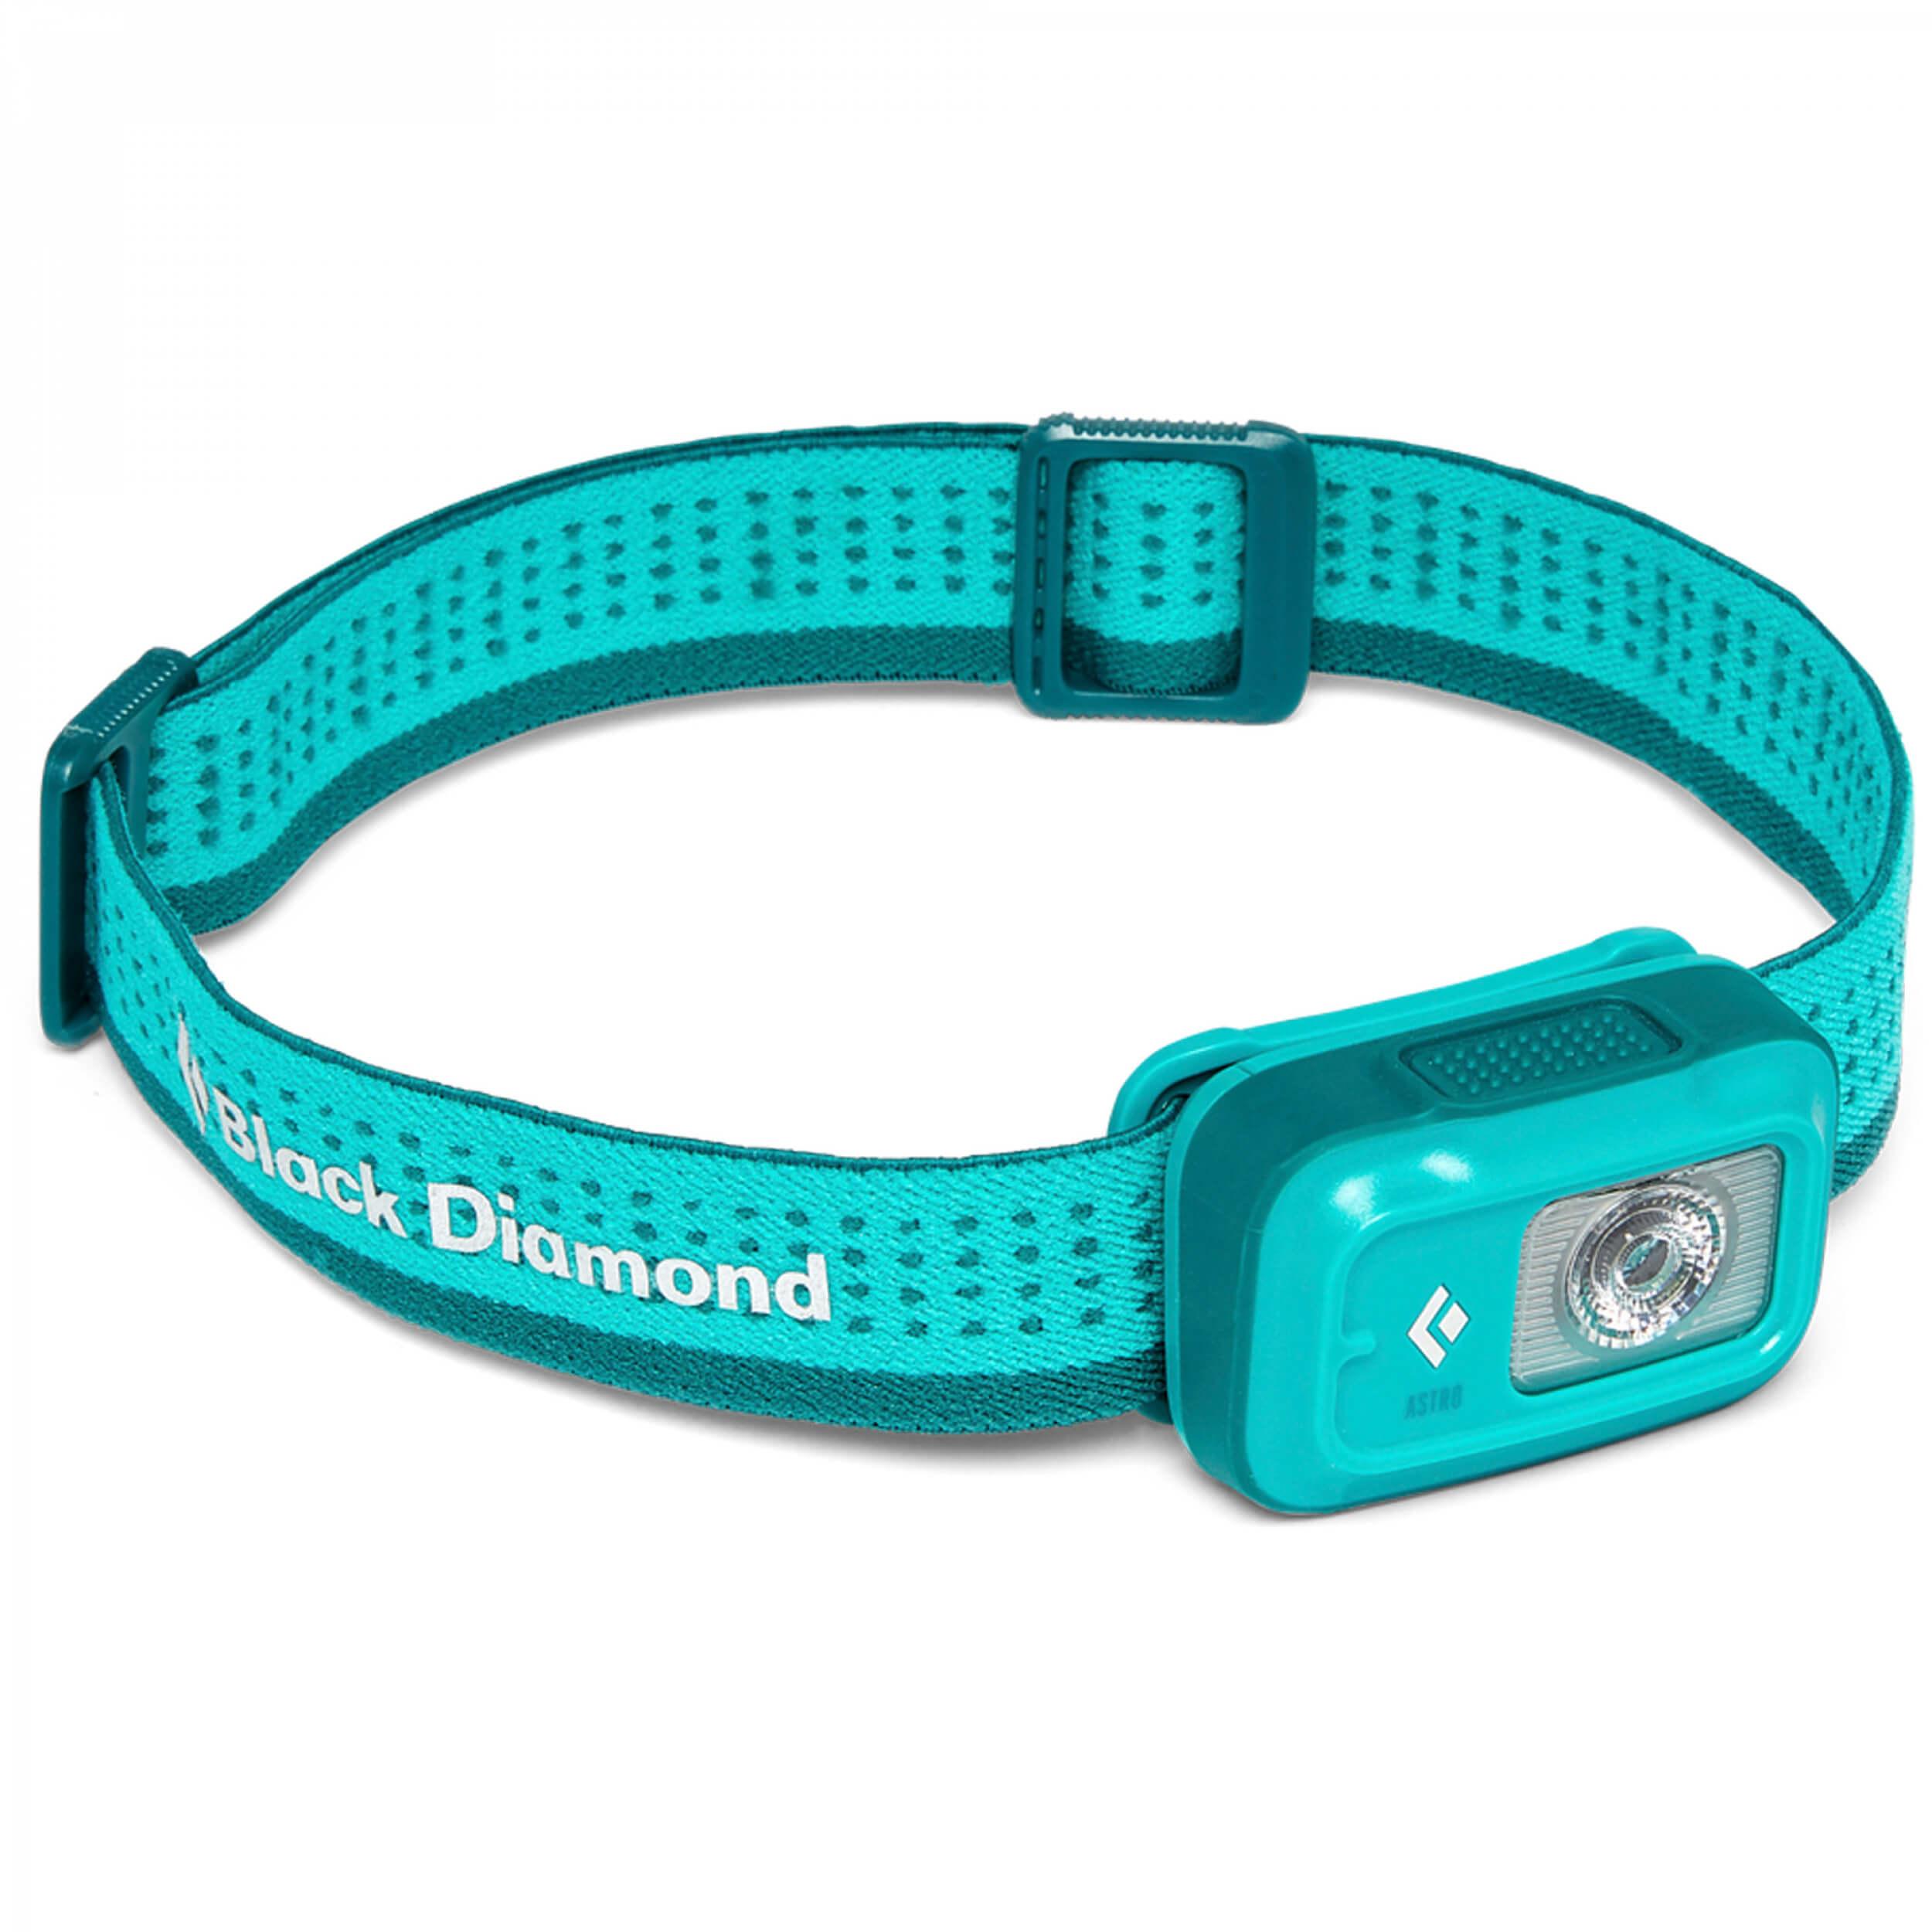 Black Diamond Astro 250 Headlamp aqua